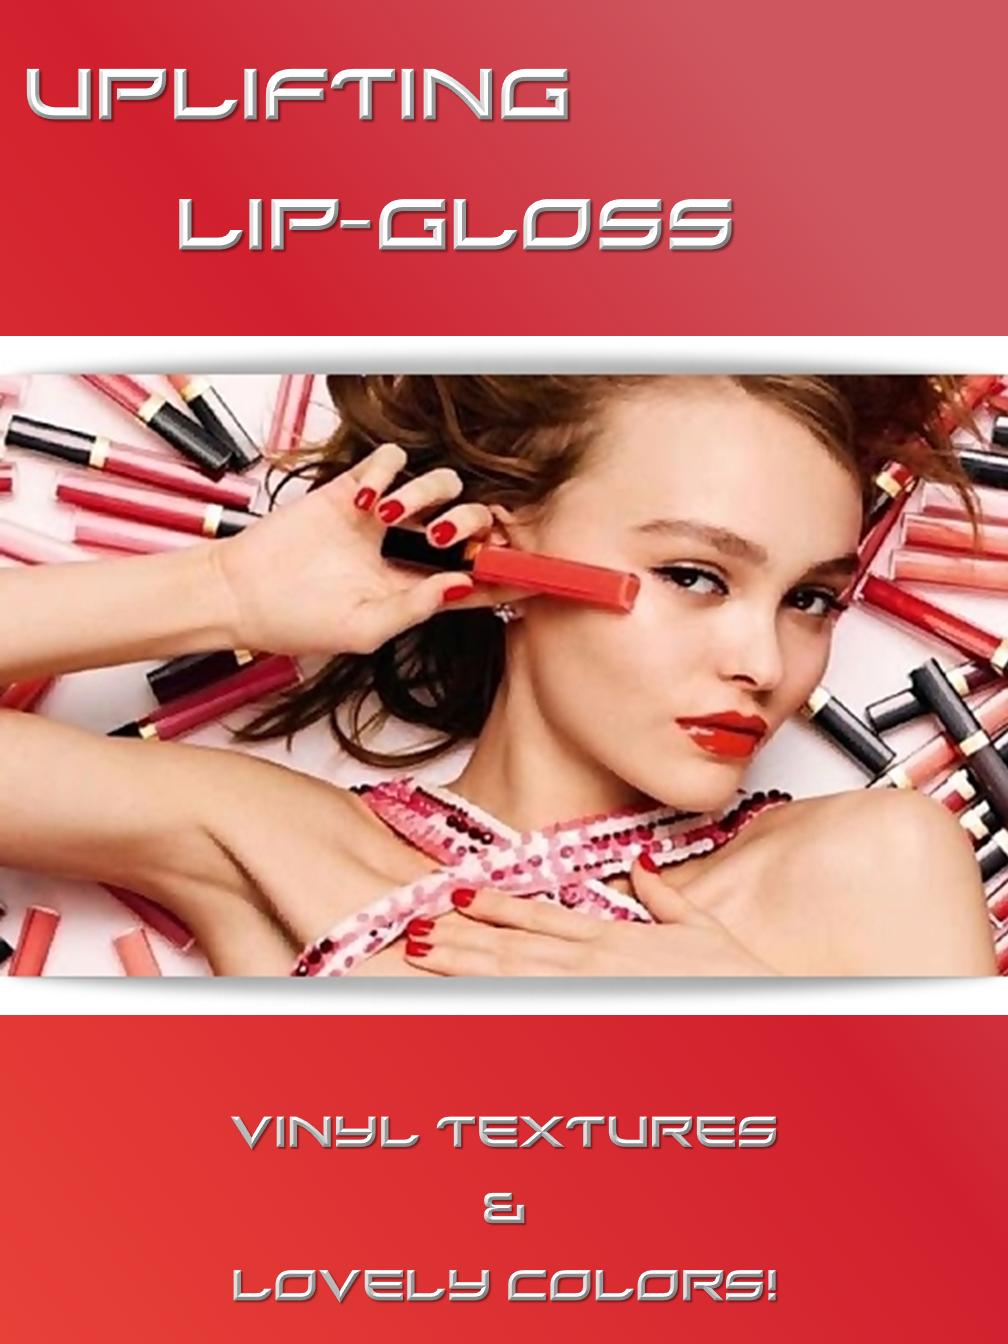 Uplifting Lip-gloss!